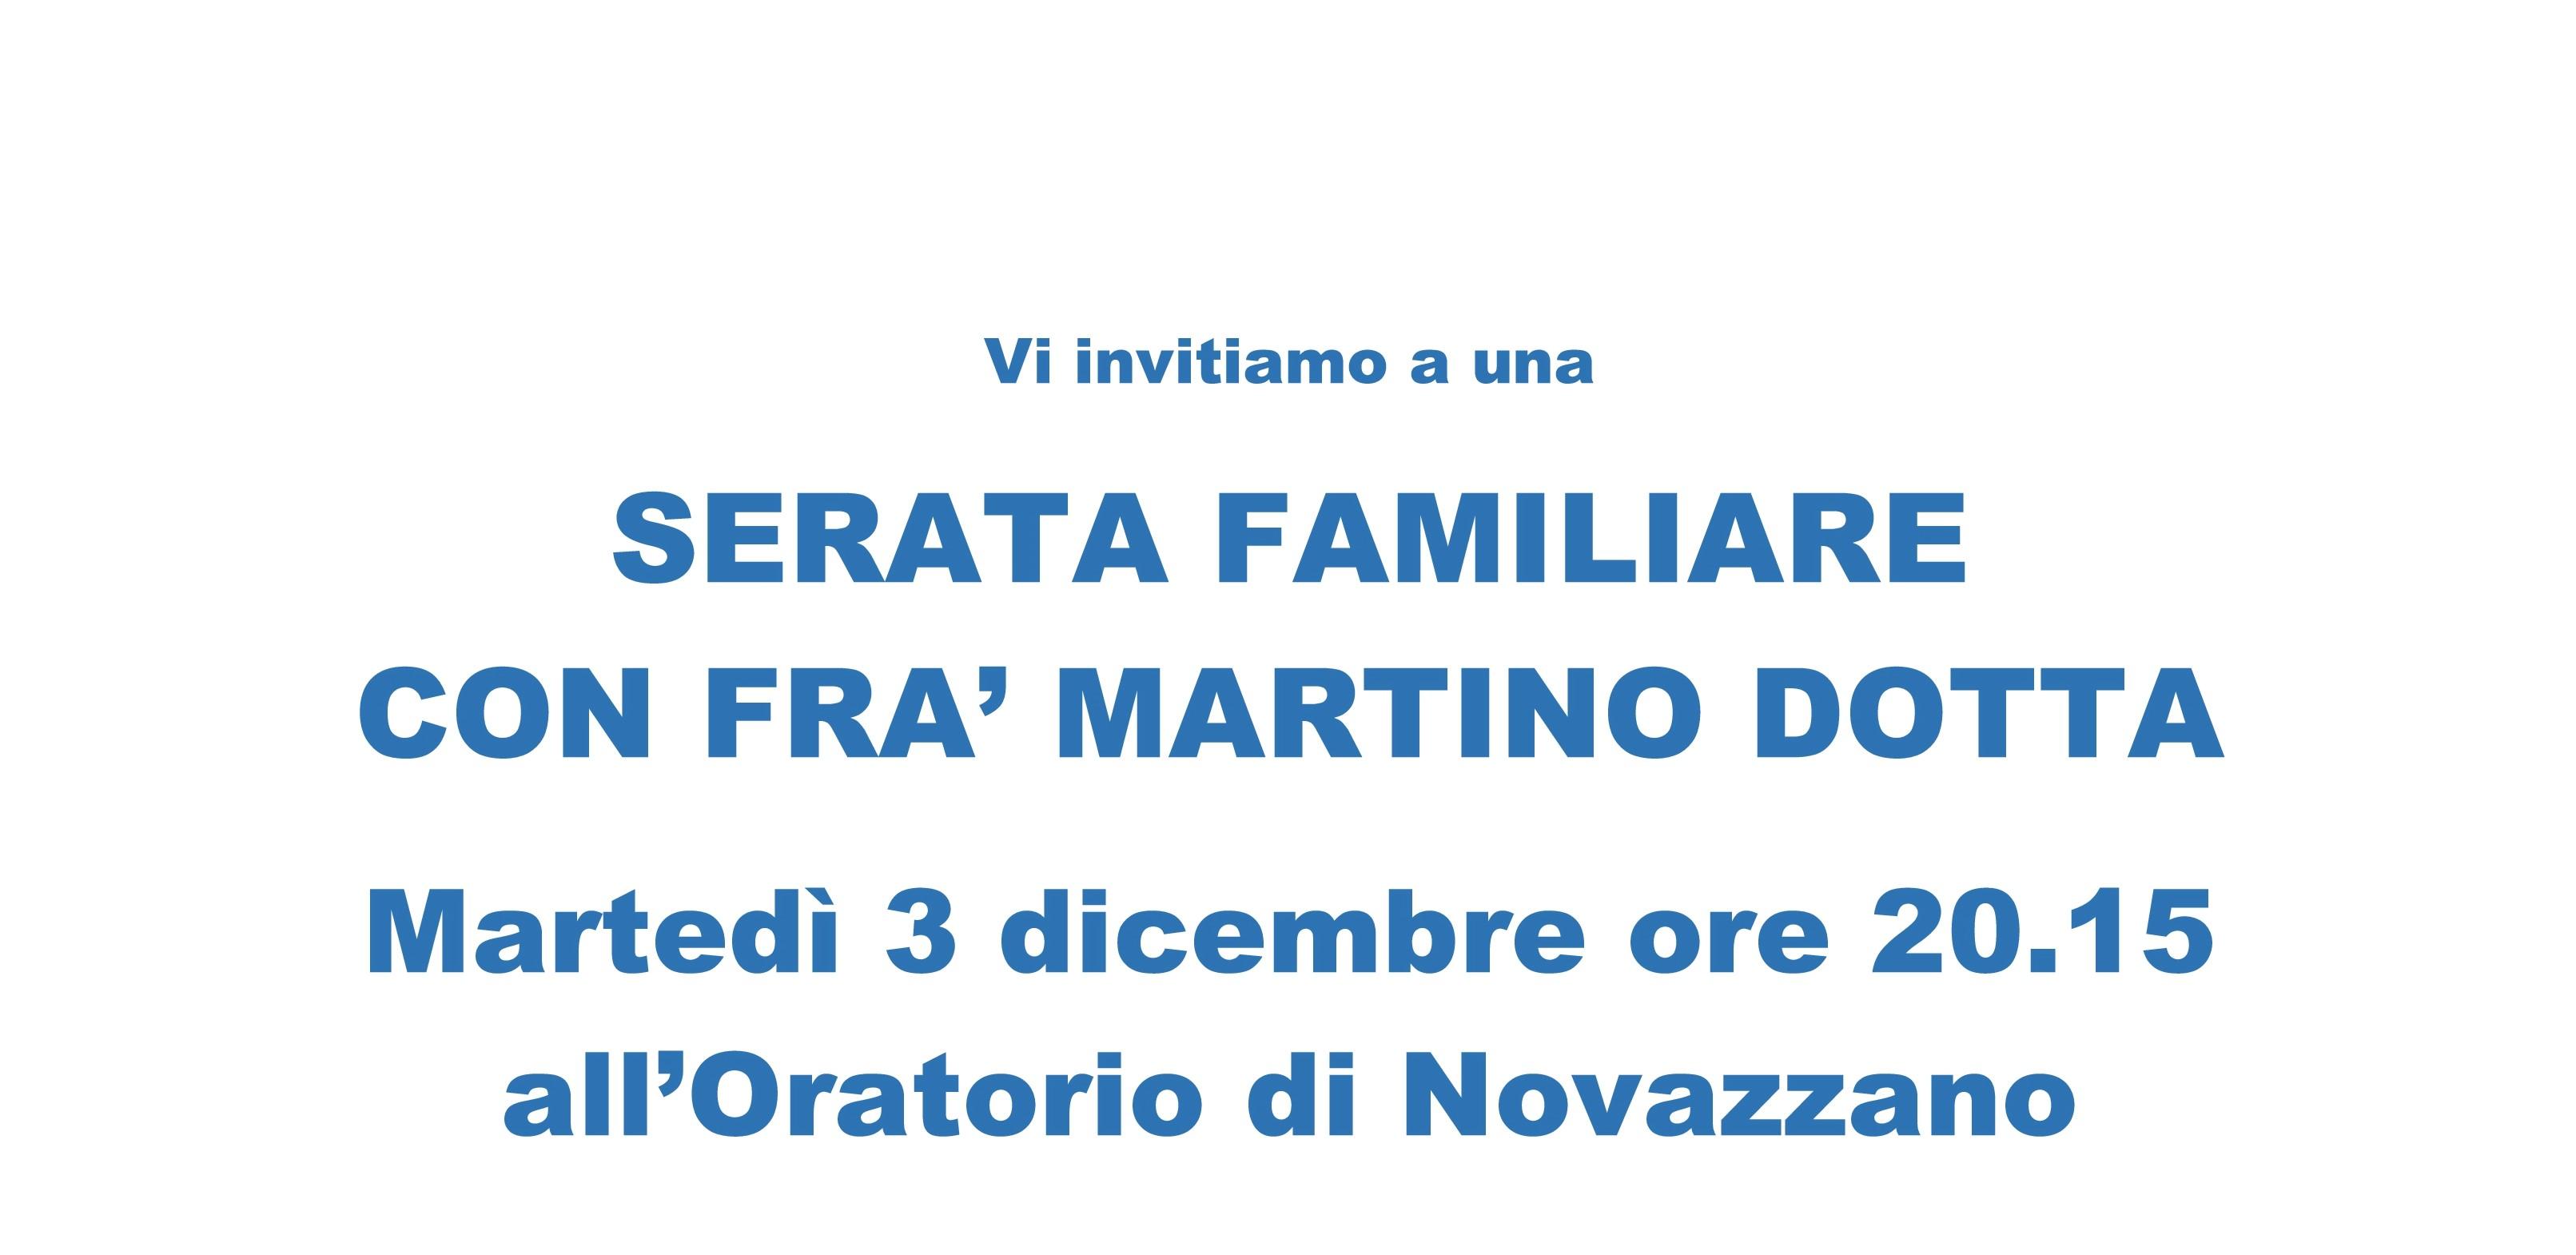 Serata Fra Martino_1